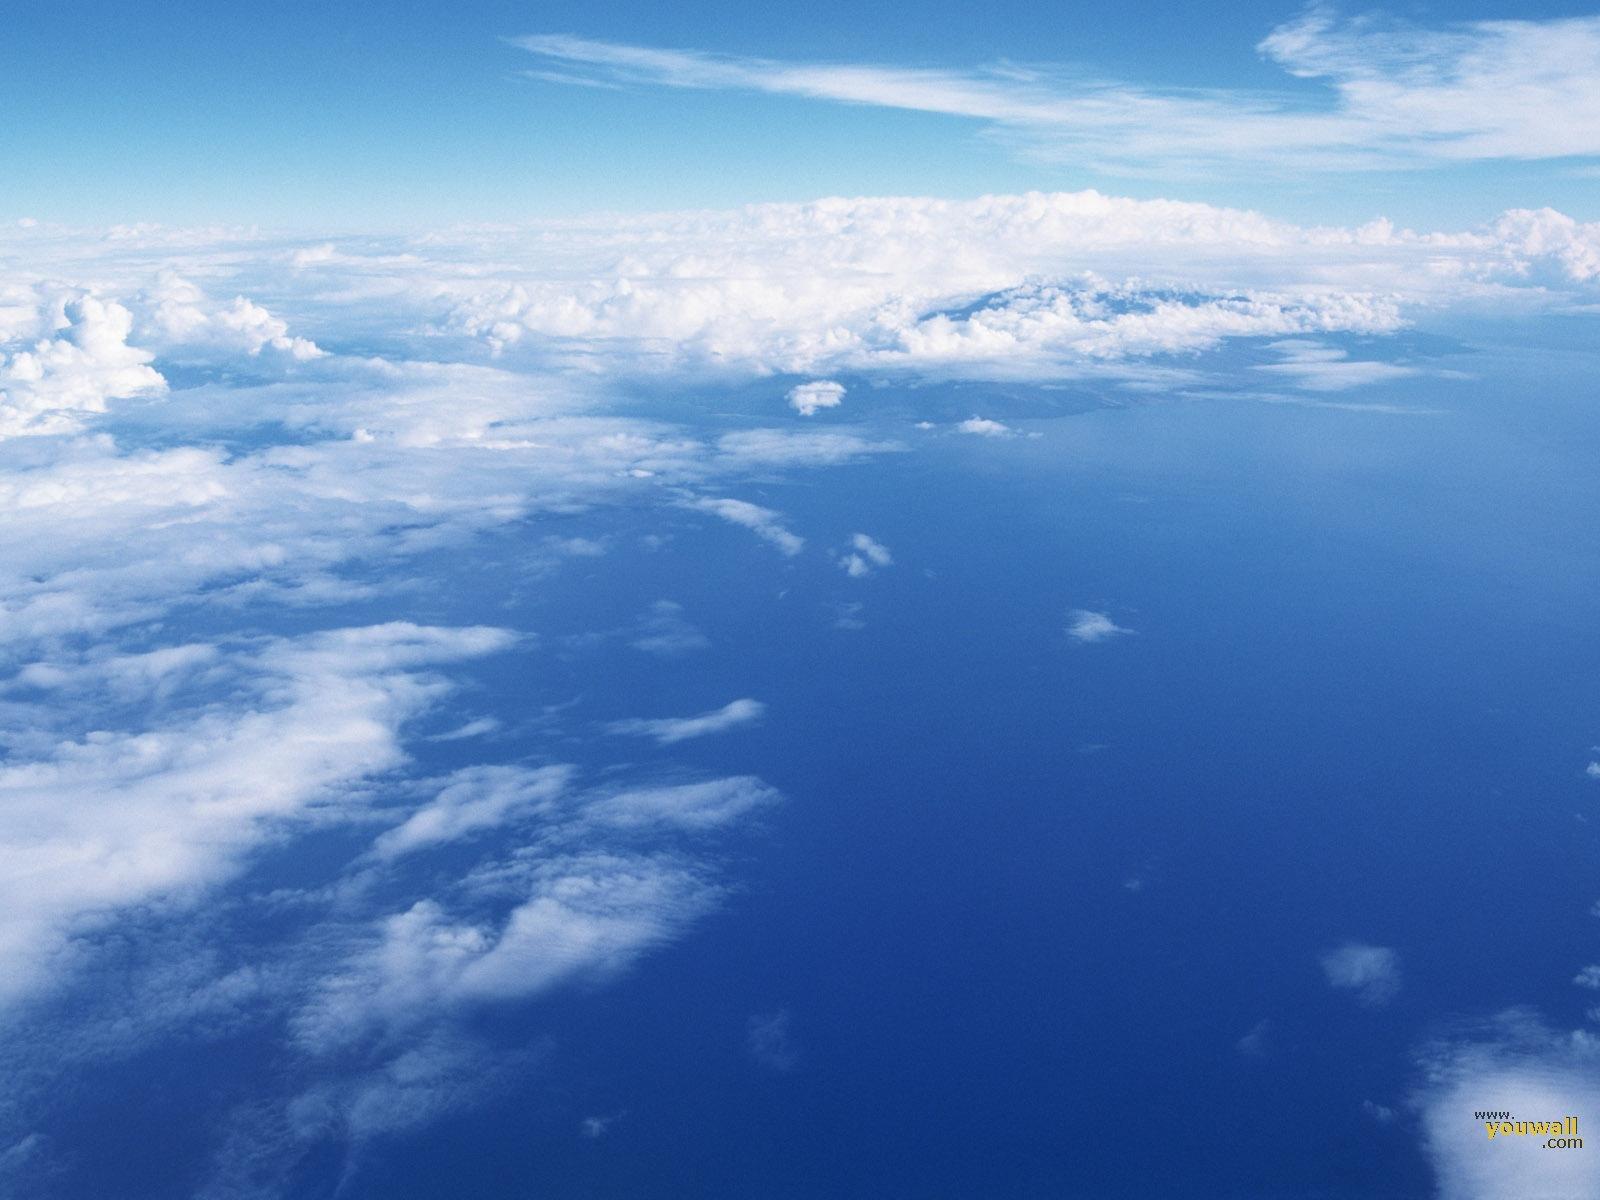 sky wallpaper for desktop - photo #19